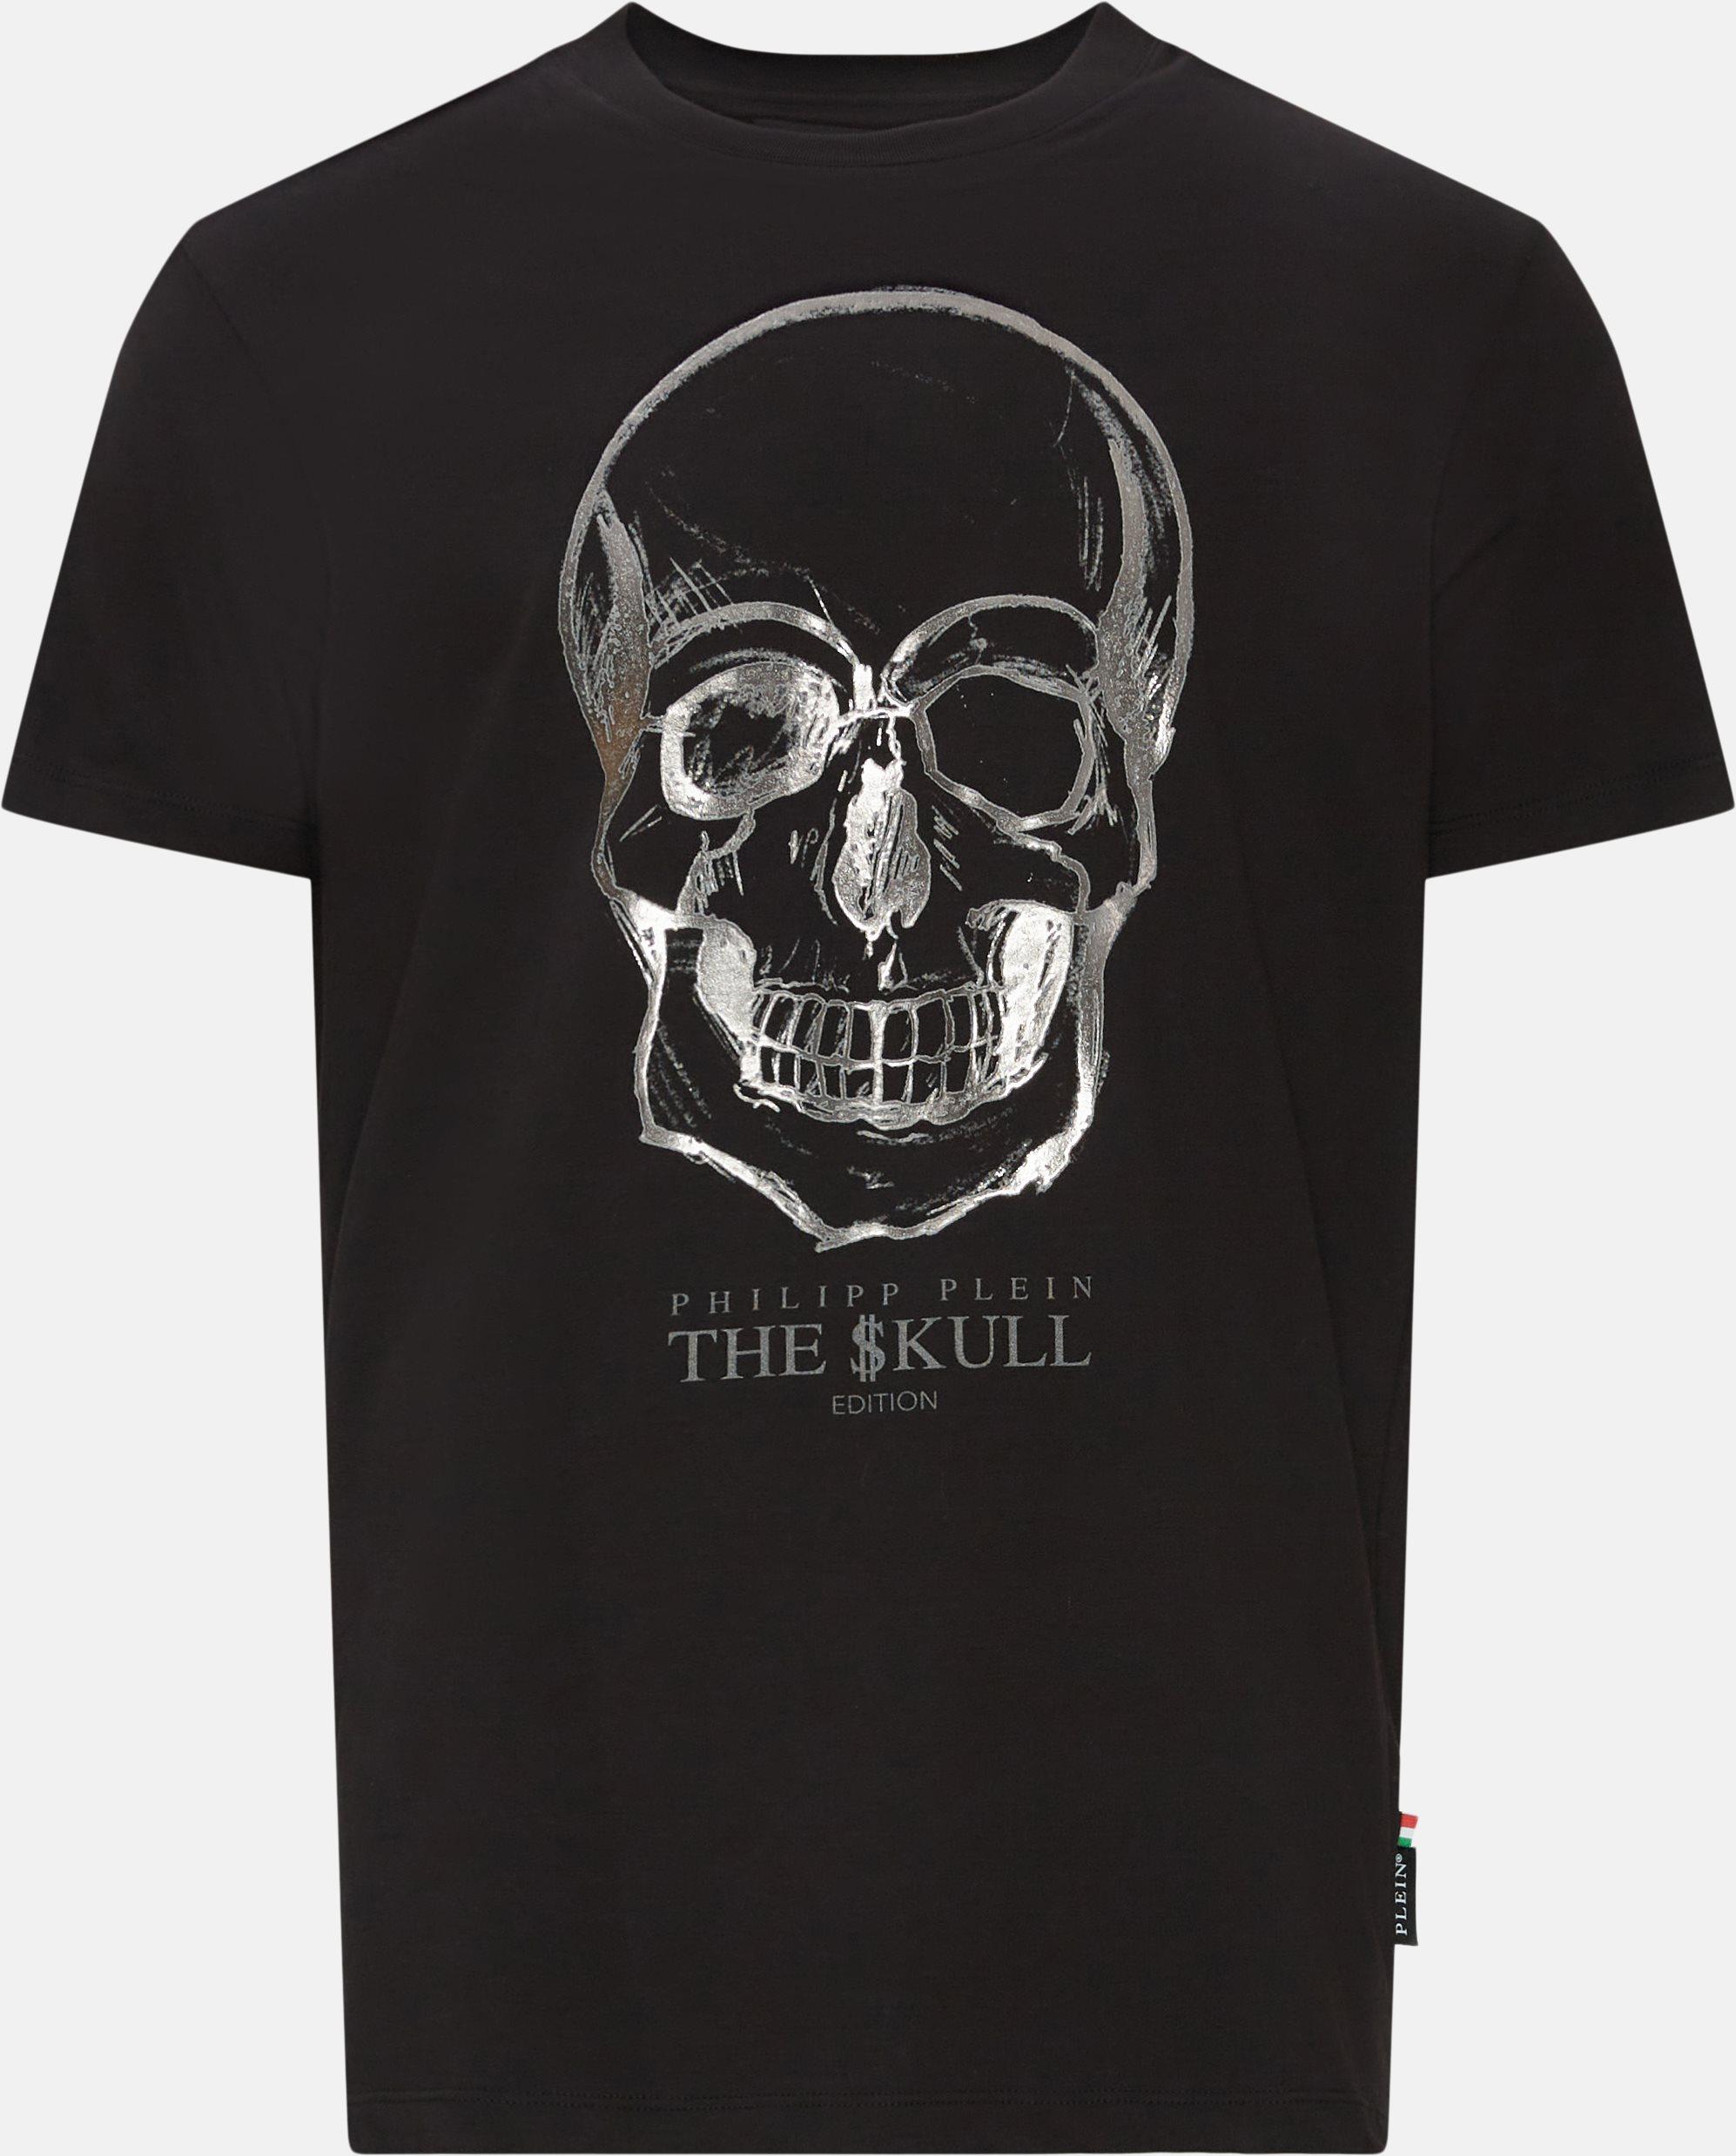 T-shirts - Regular fit - Black